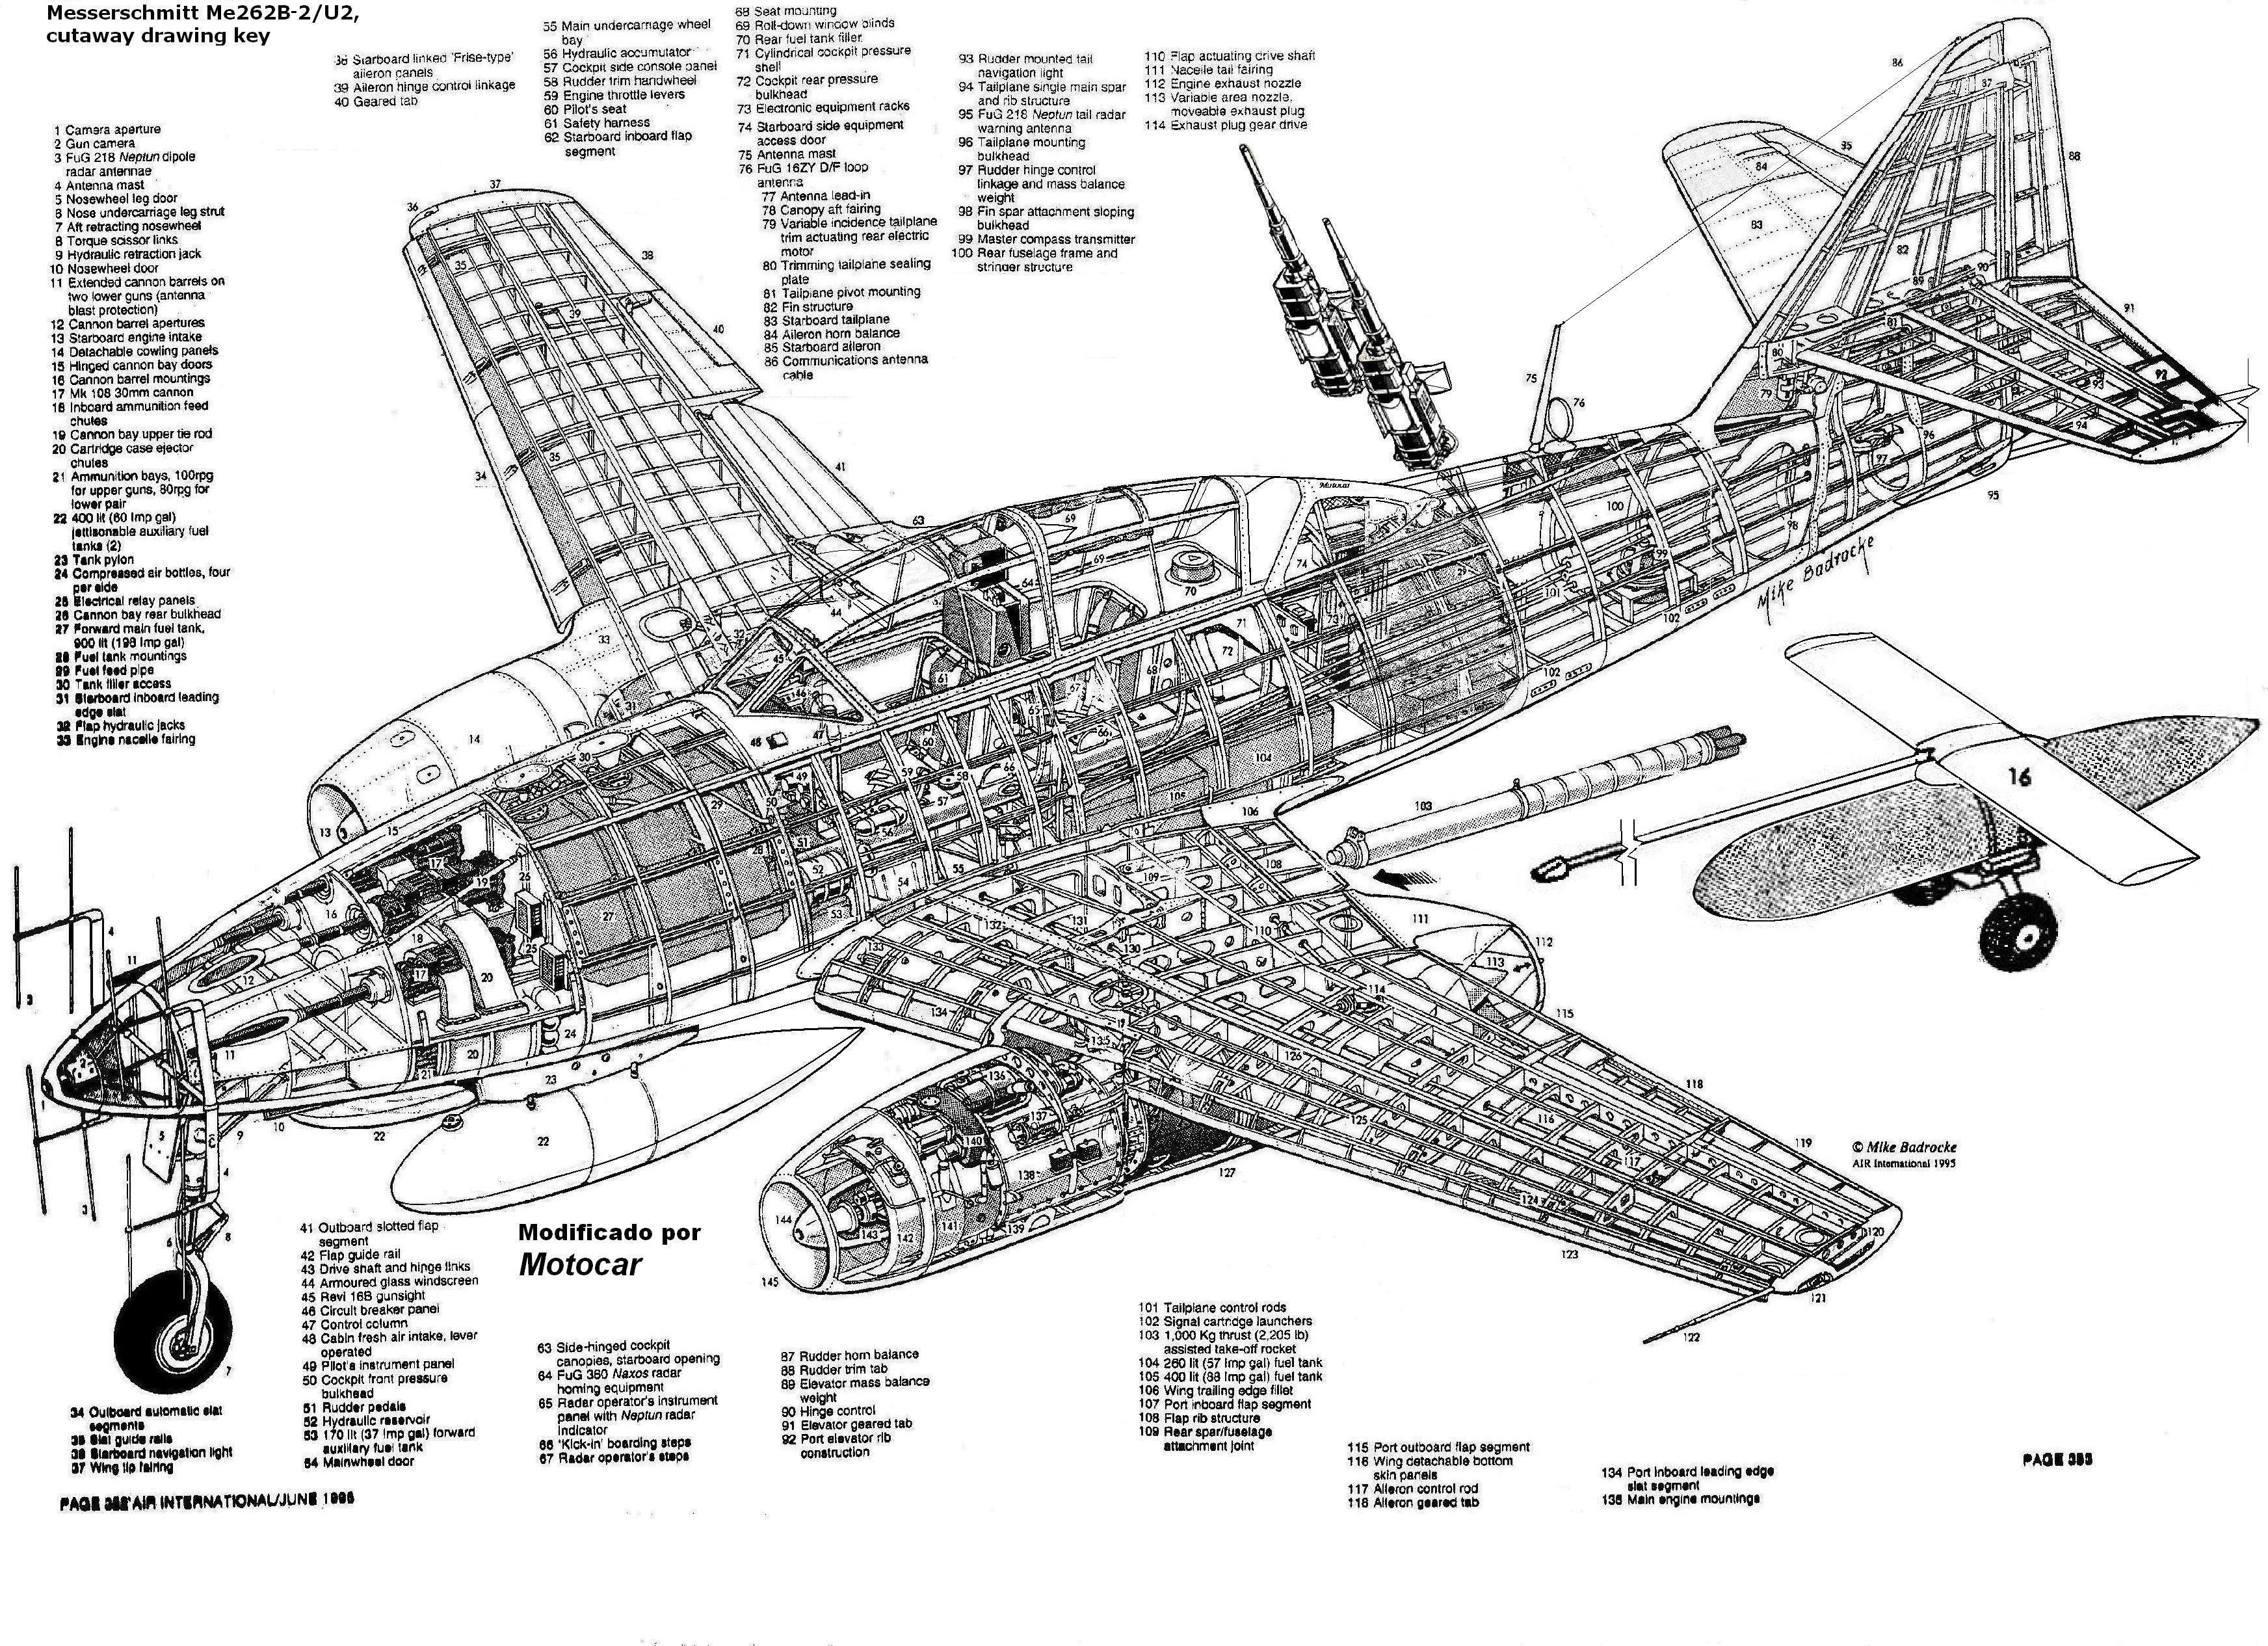 Me262 Night Fighter Cutaway